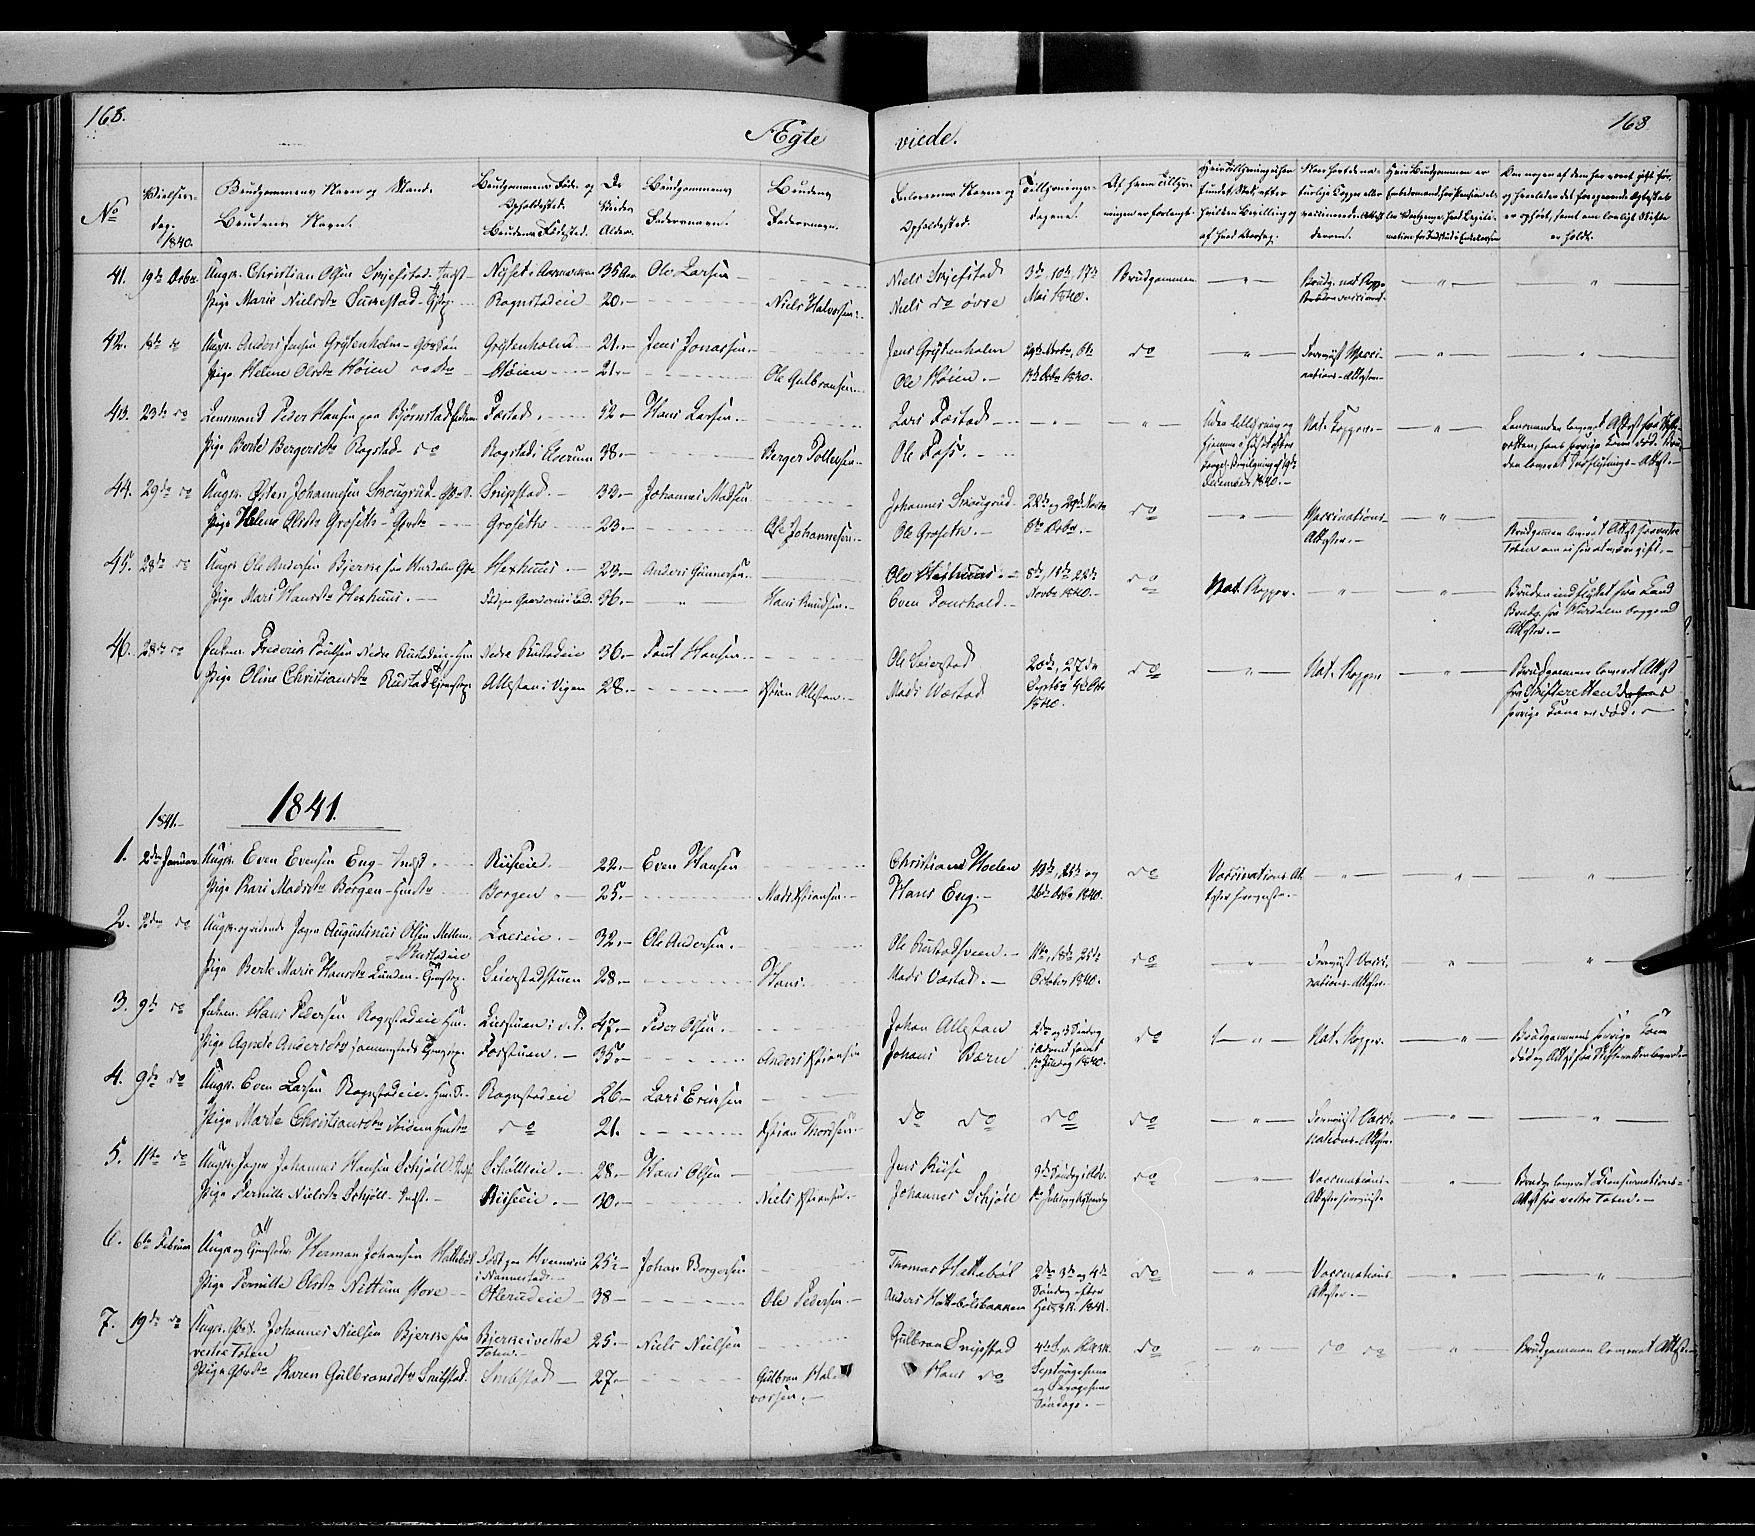 SAH, Østre Toten prestekontor, Ministerialbok nr. 2, 1840-1847, s. 168